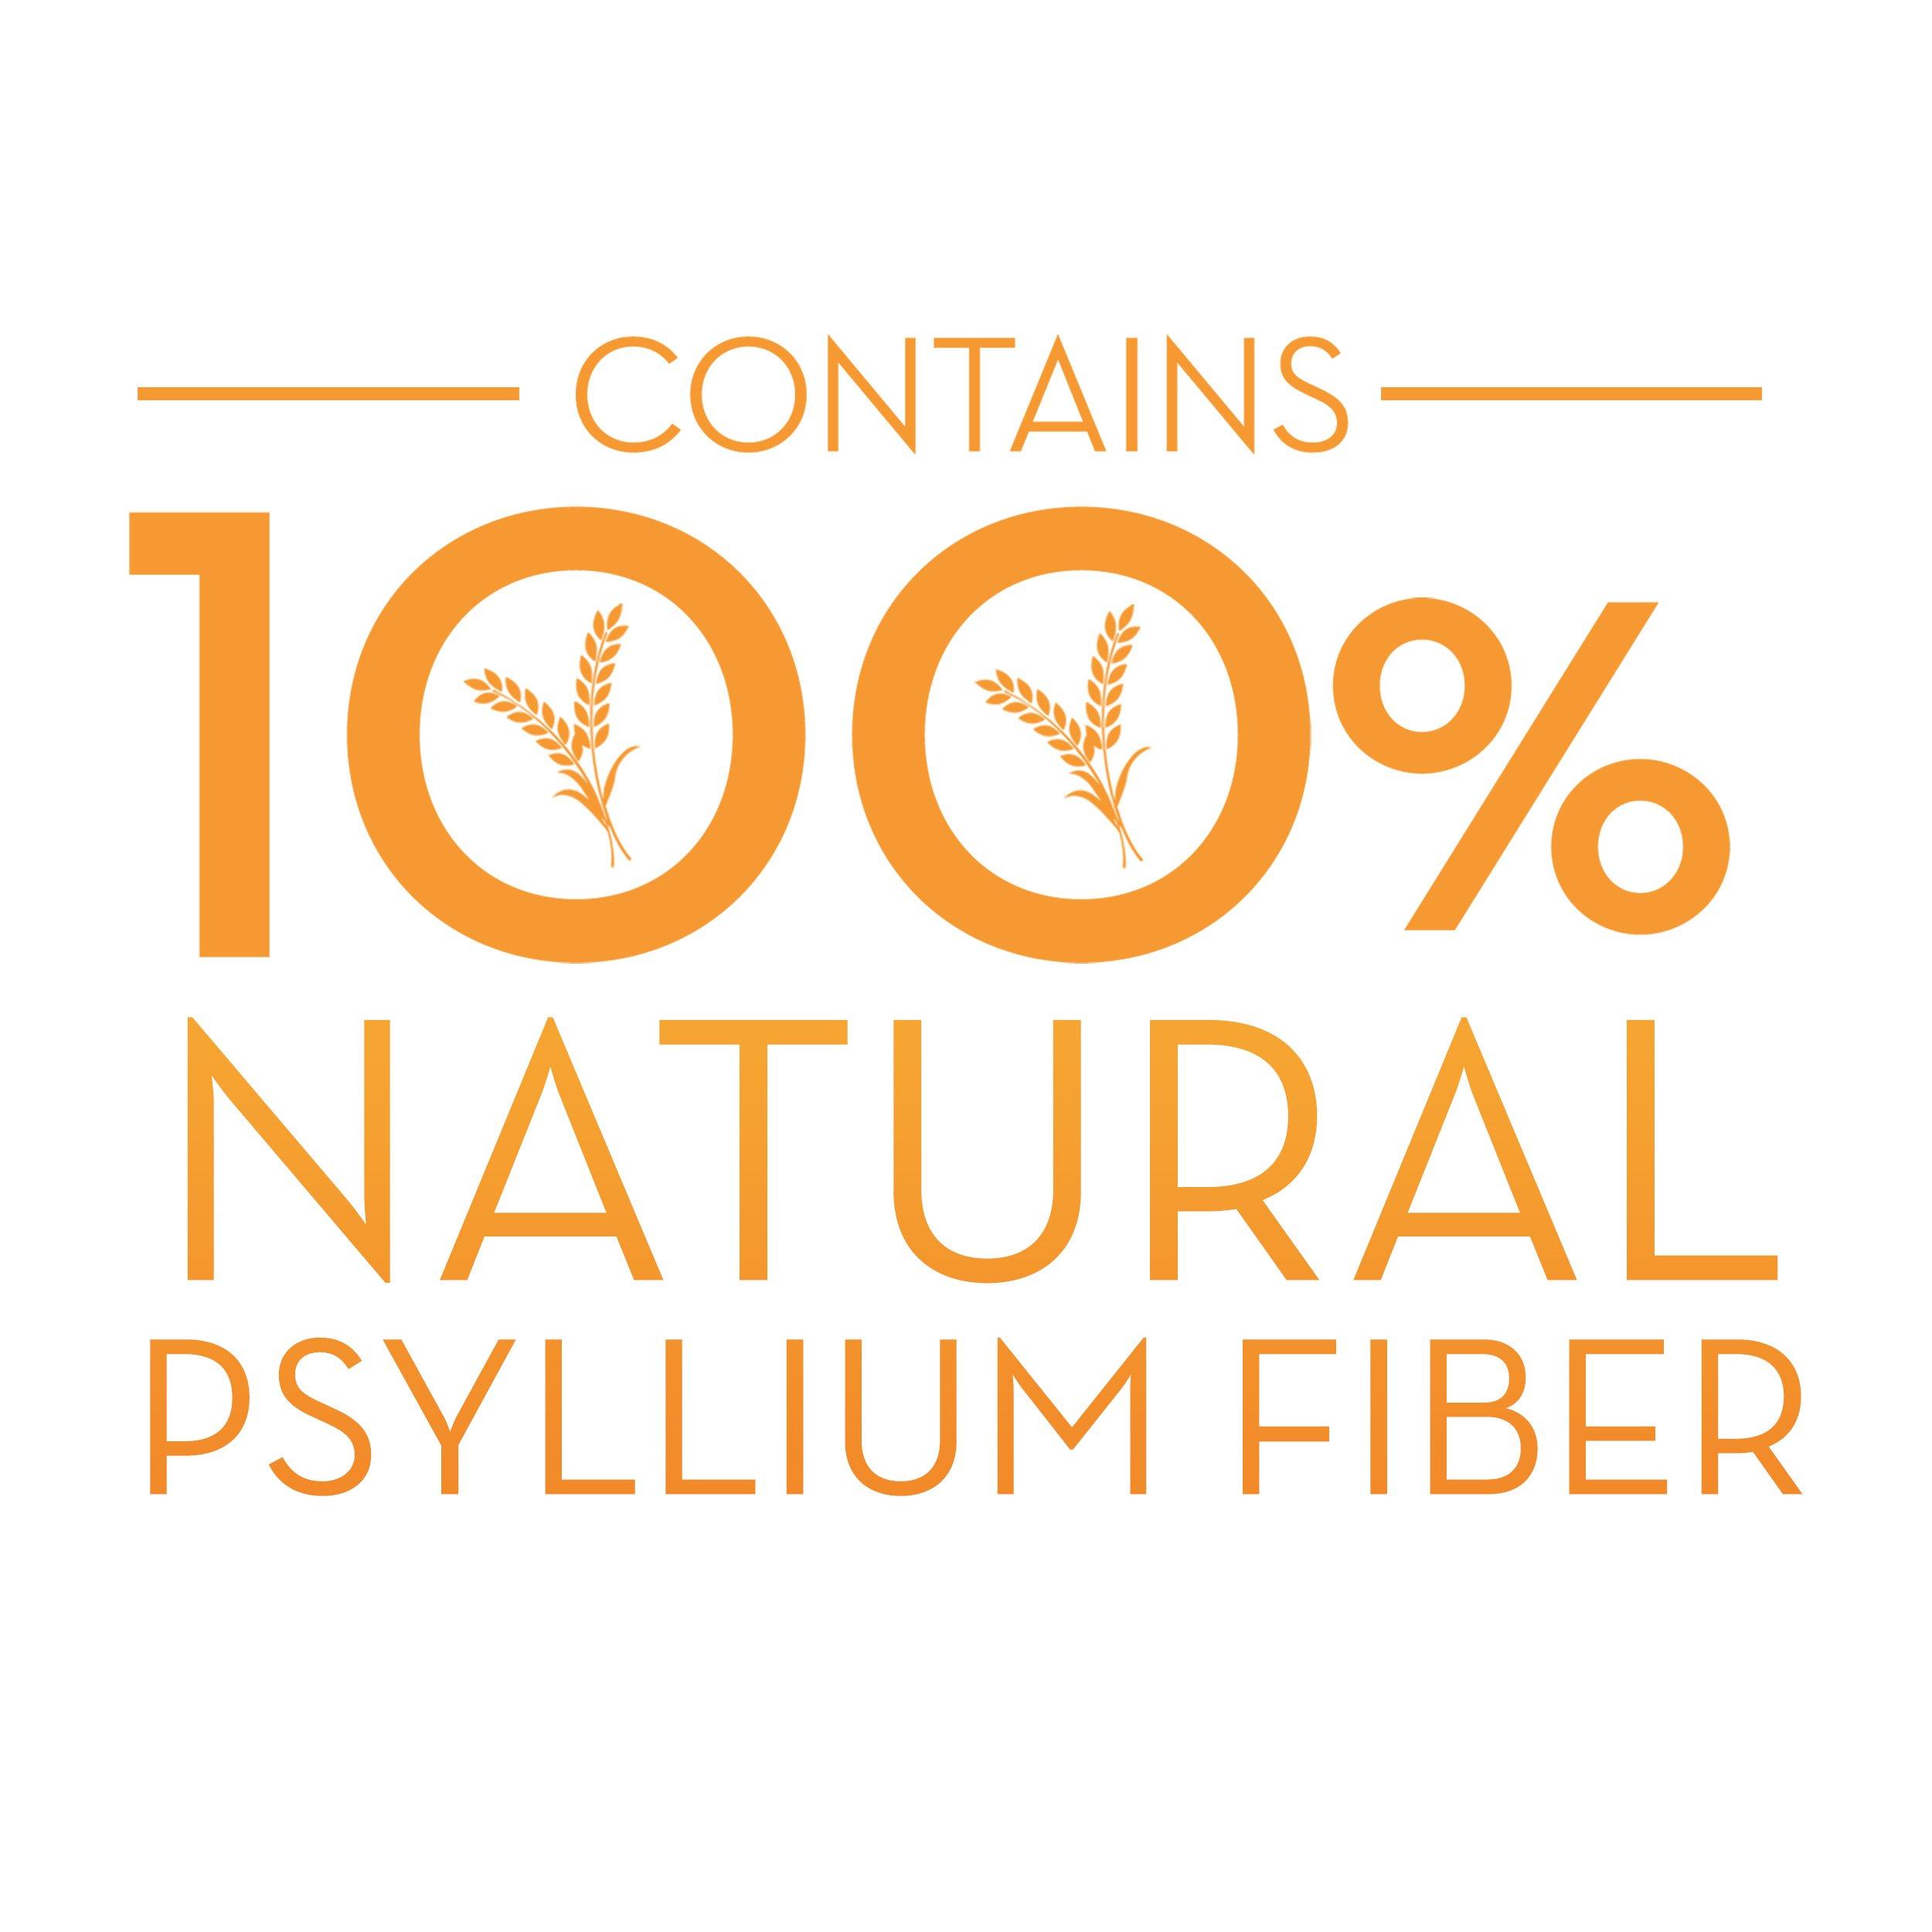 Metamucil Cinnamon Spice Flavored Fiber Thins Supplement with Psyllium Husk, 12 Servings (Pack of 4) by Metamucil (Image #4)